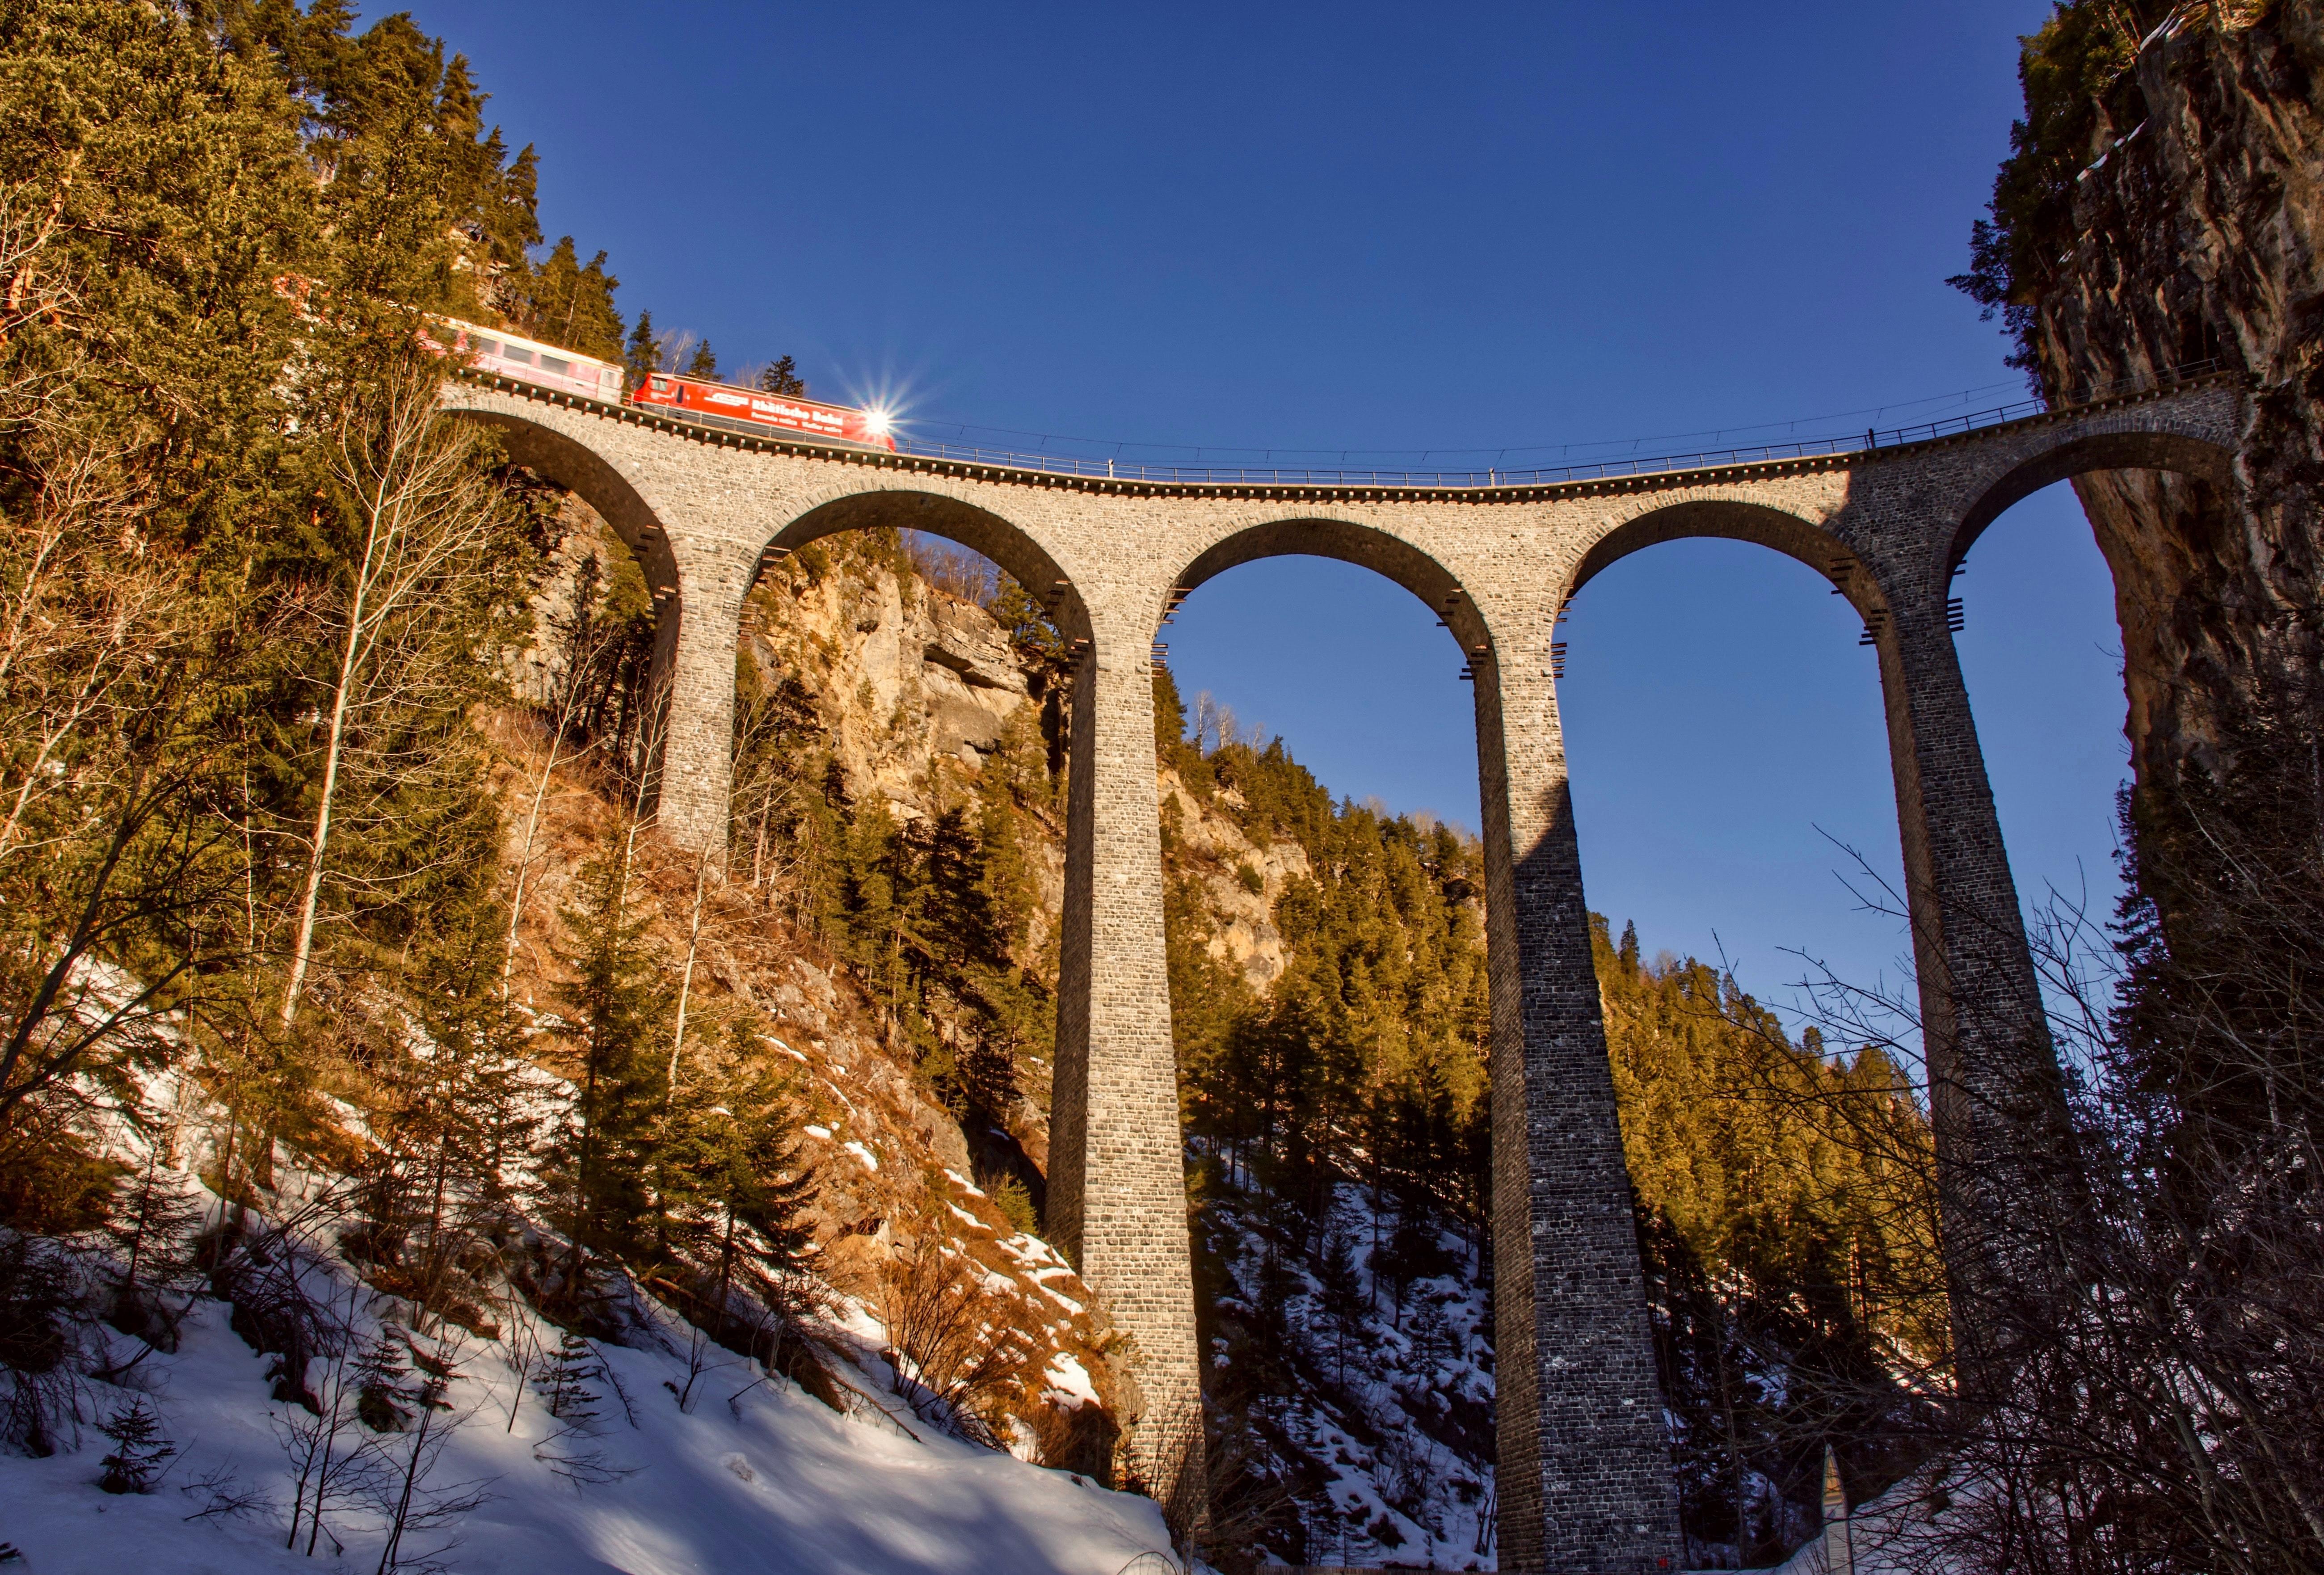 Ride in Bernina Express, Things to do in Switzerland